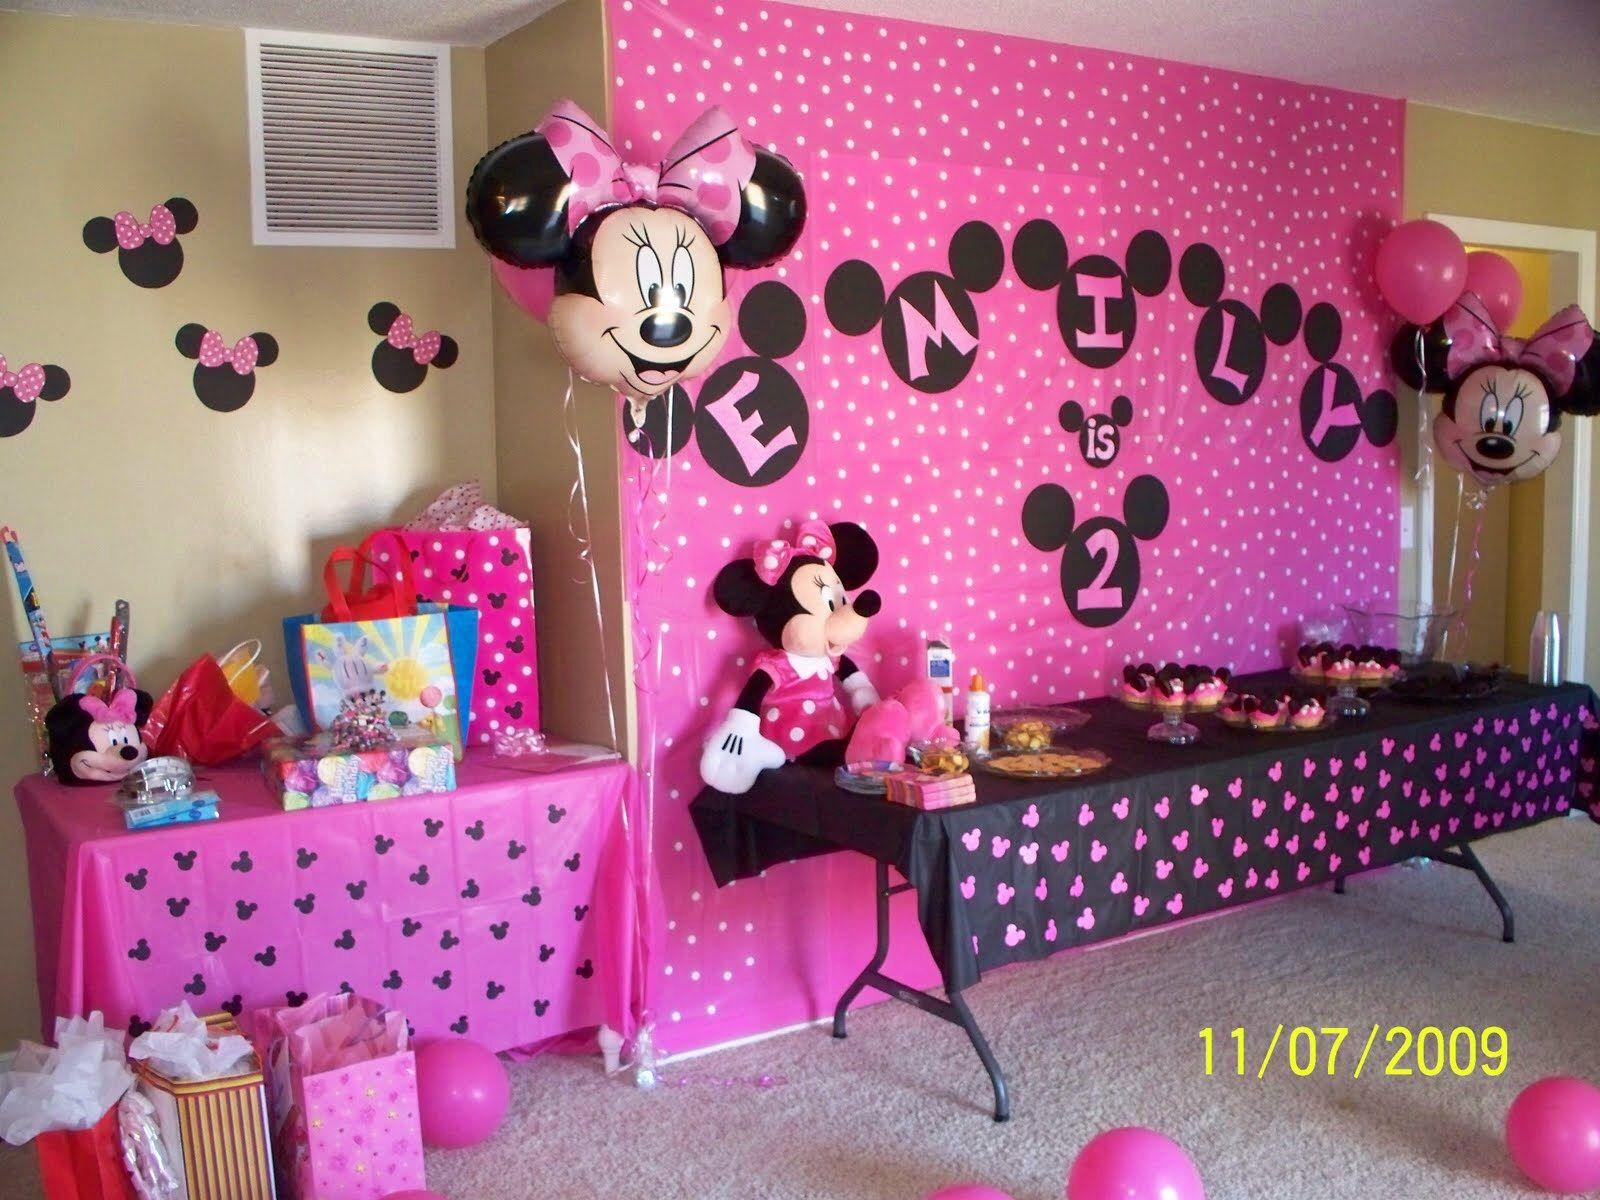 Minnie Mouse 1st Birthday Wall Decoration - Wall Decor Ideas